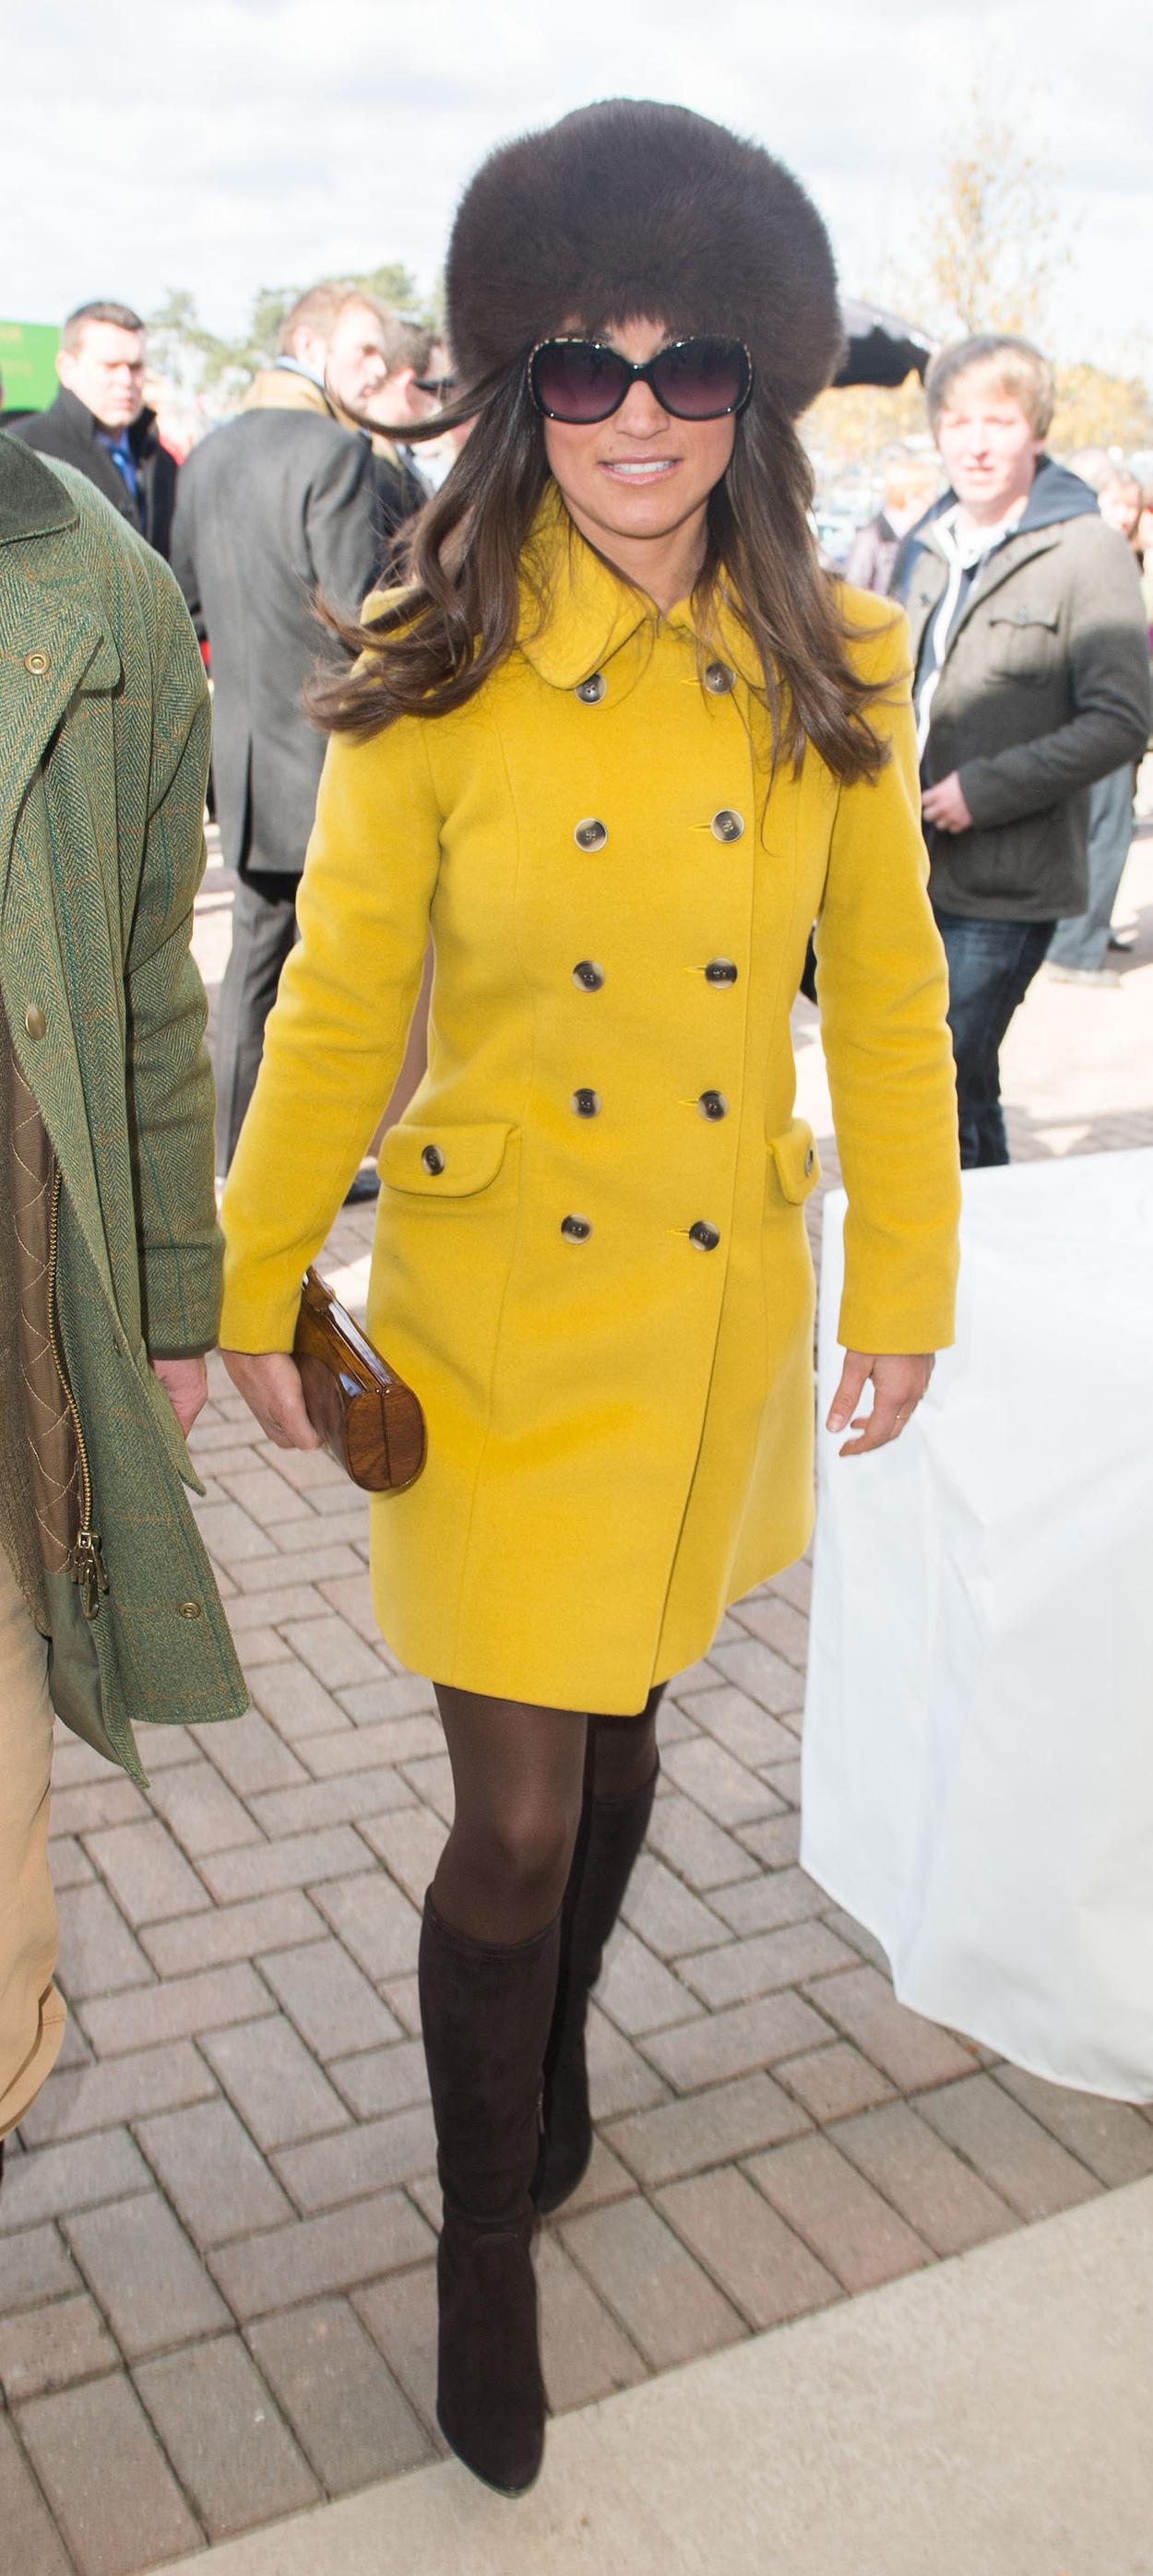 Los mejores looks de Pippa Middleton